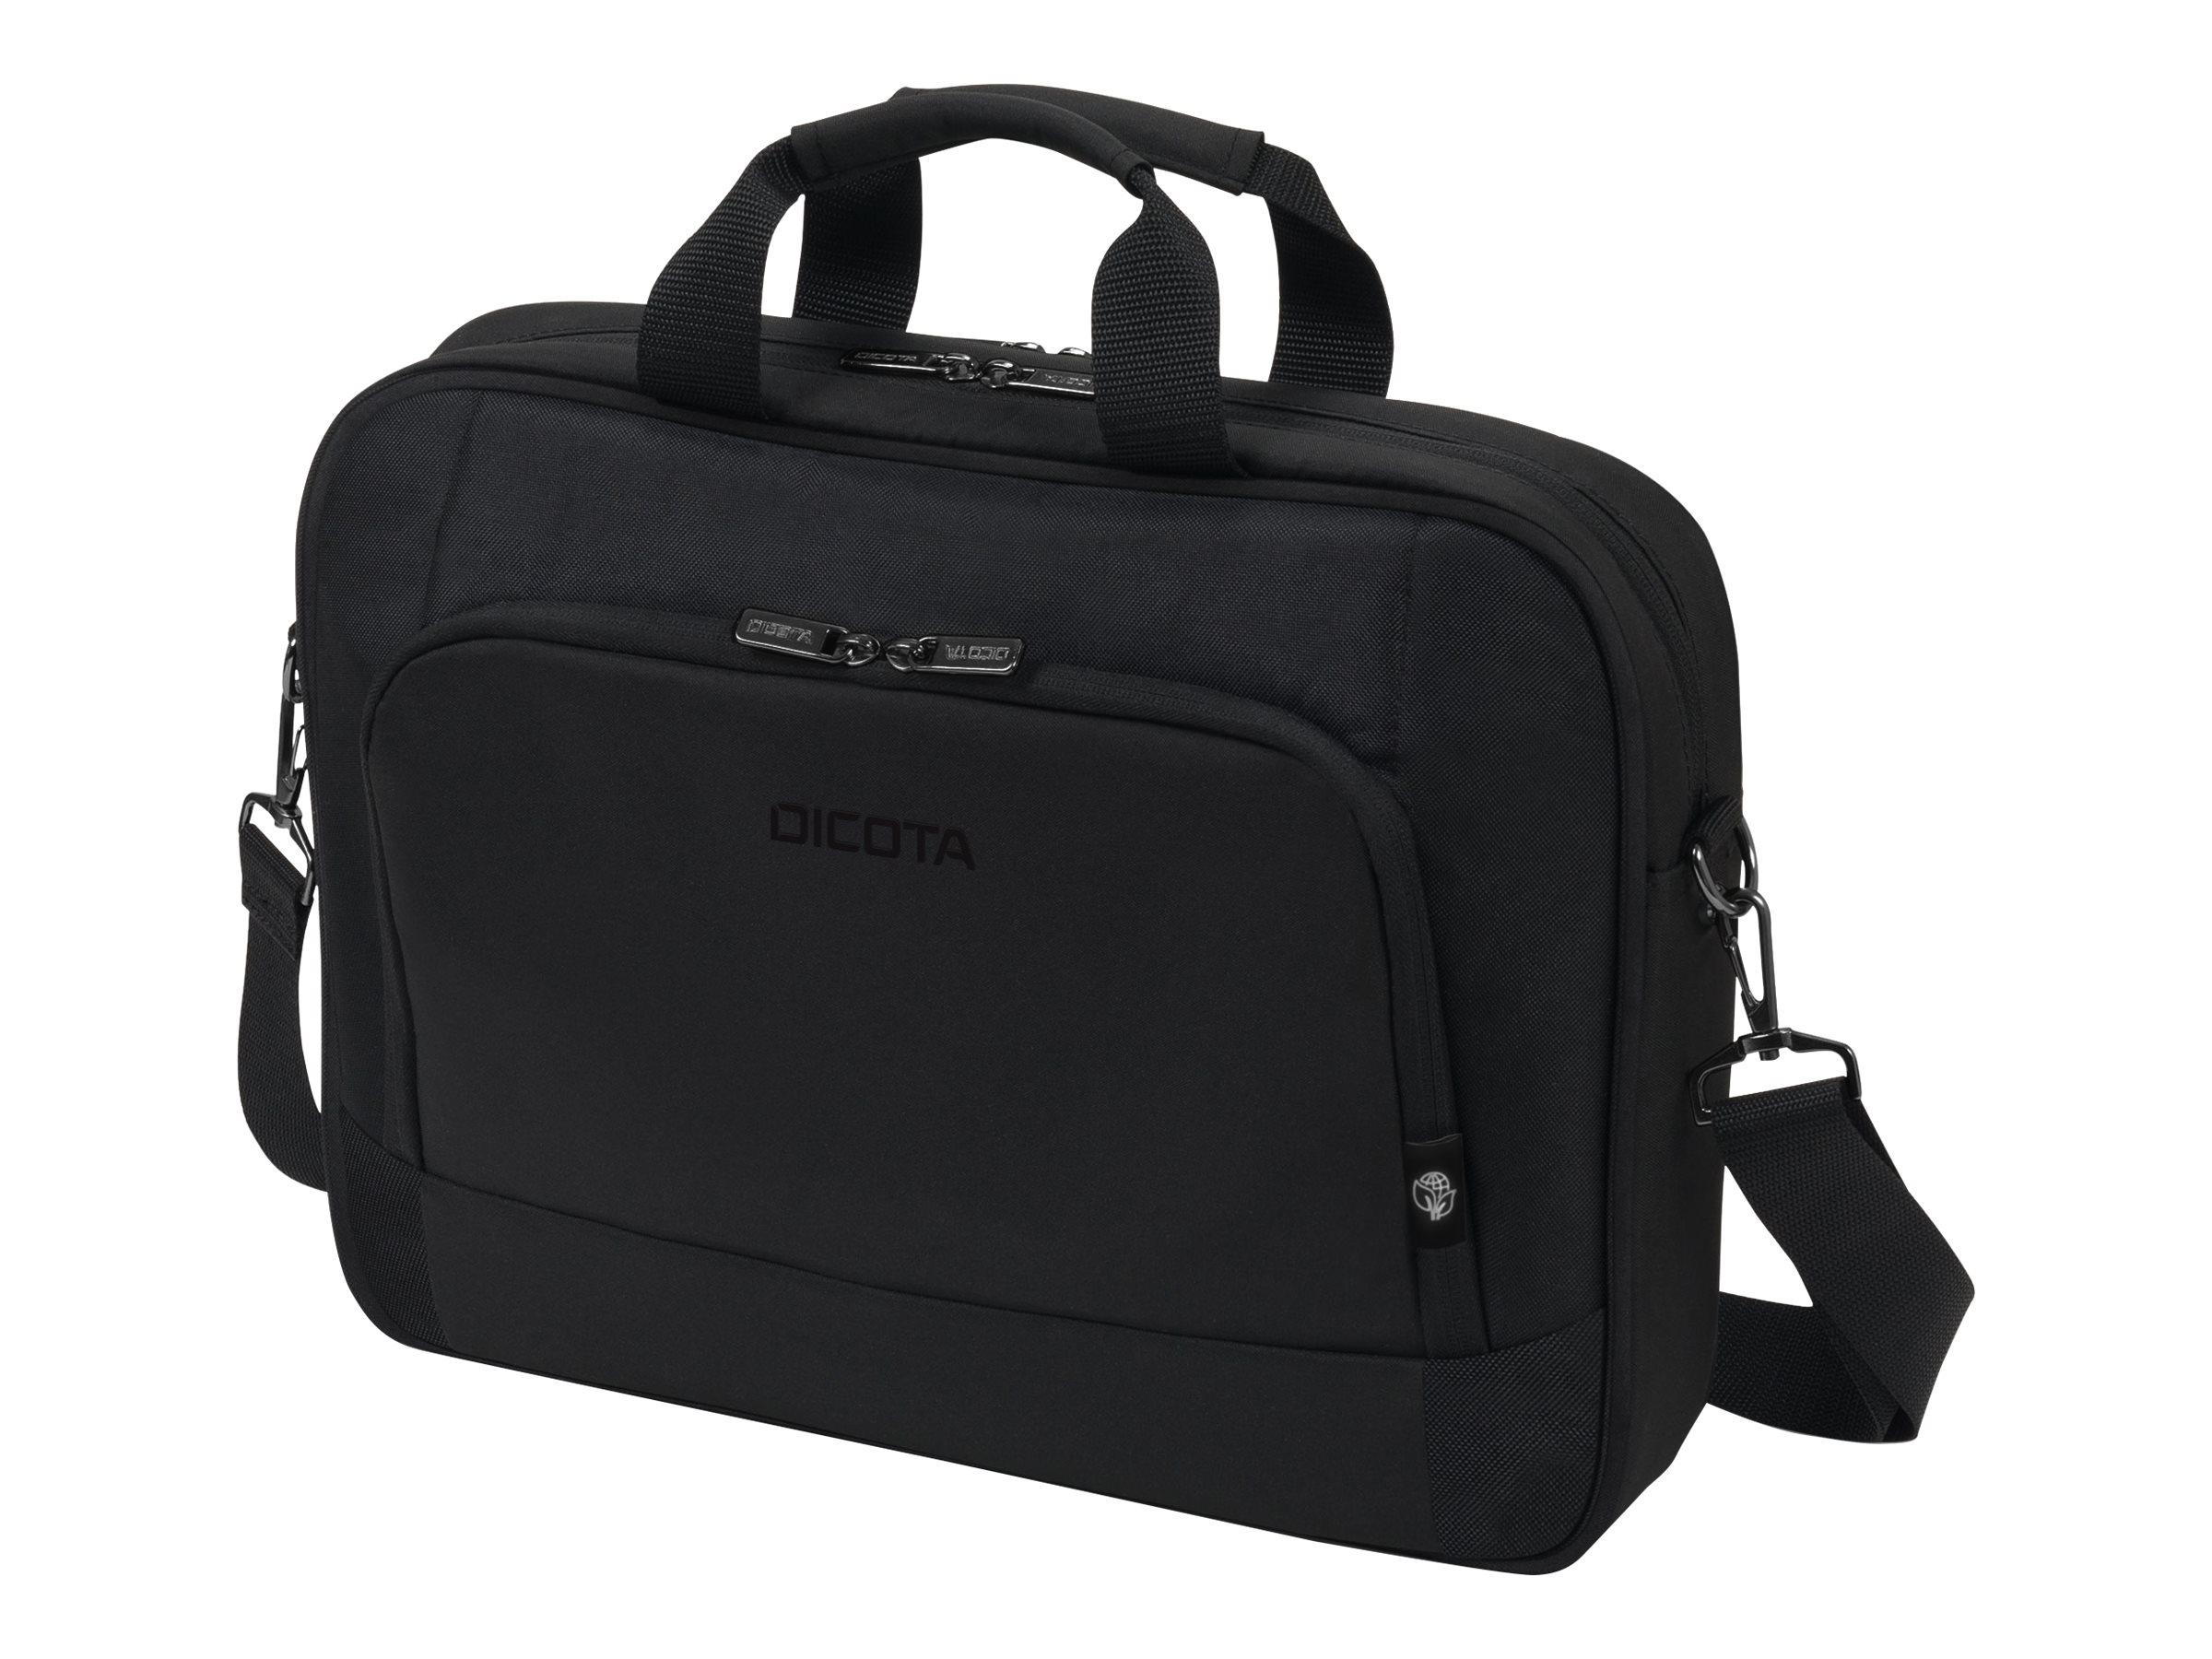 DICOTA Eco - Notebook-Tasche - 39.6 cm - 15